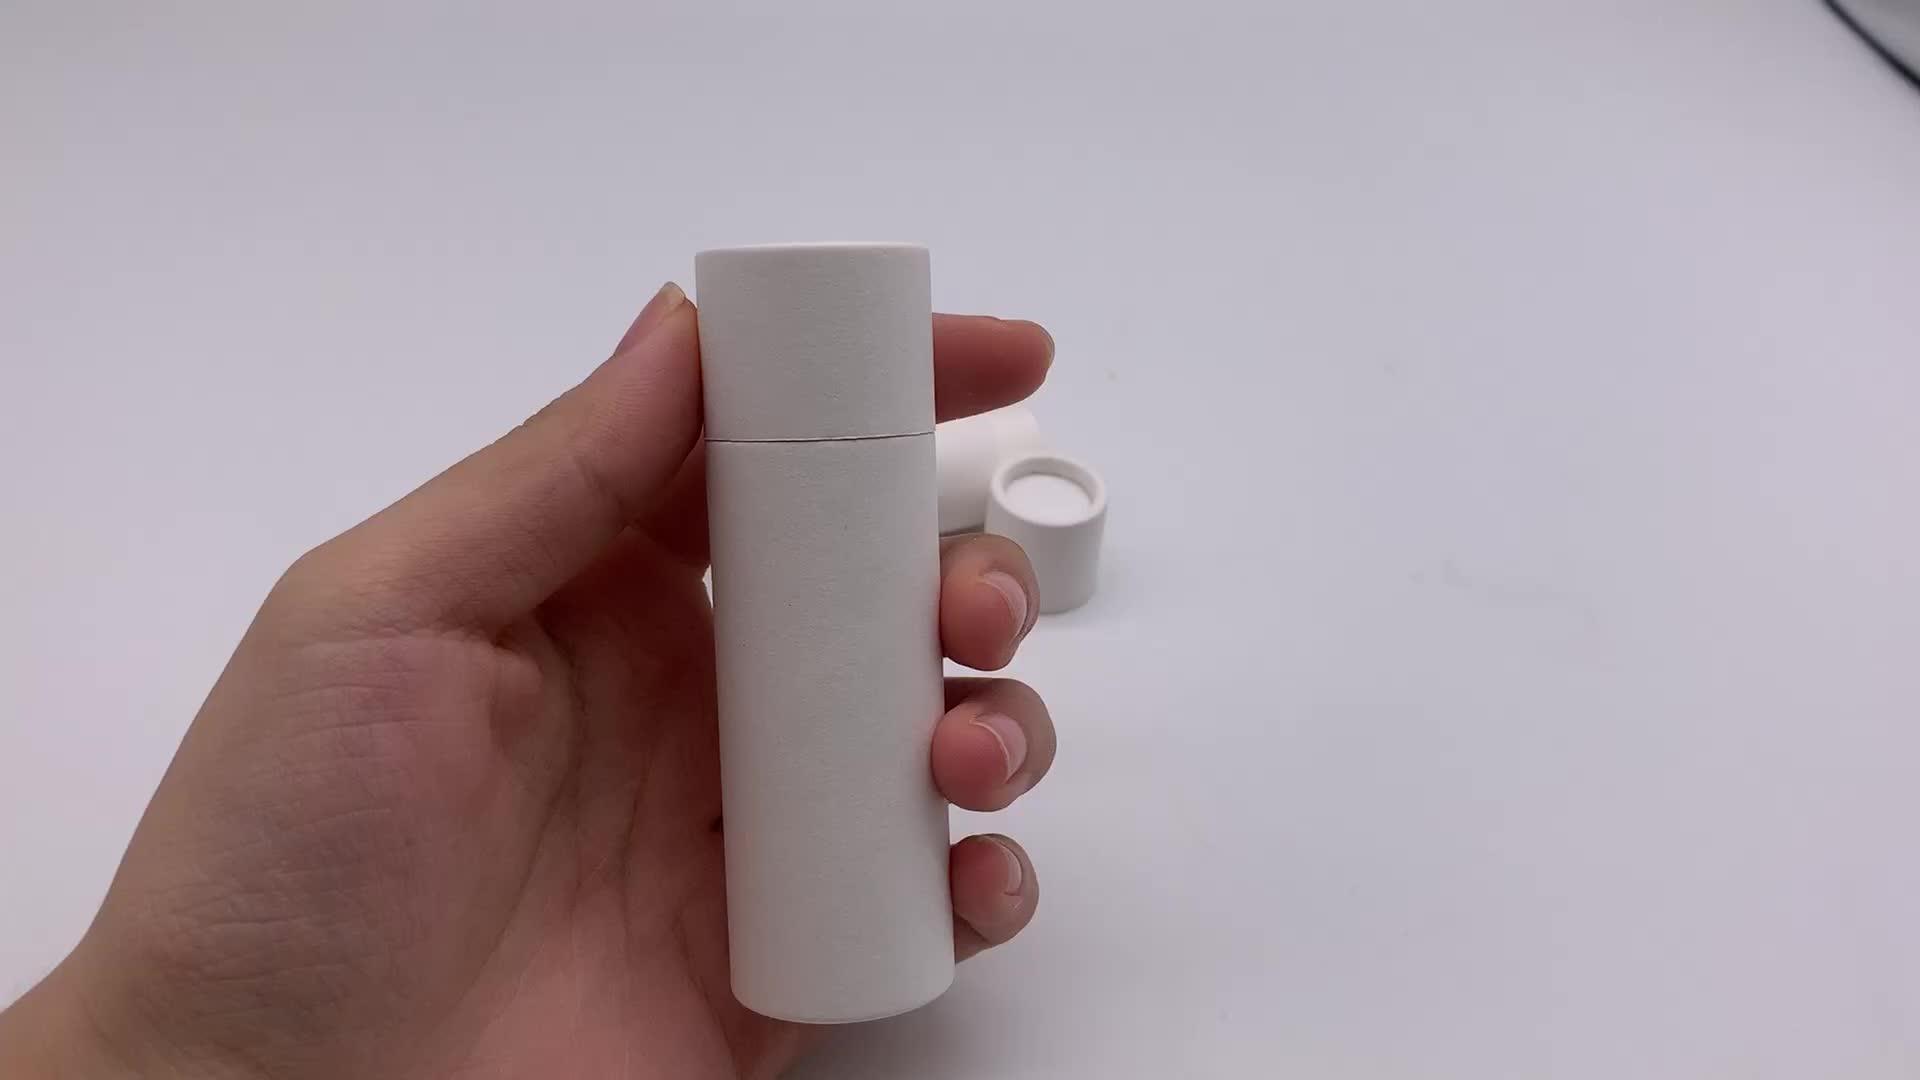 Matte เครื่องสำอางระงับกลิ่นกายบรรจุภัณฑ์ย่อยสลายได้กระดาษแข็งคอนเทนเนอร์ Push Up หลอดกระดาษ